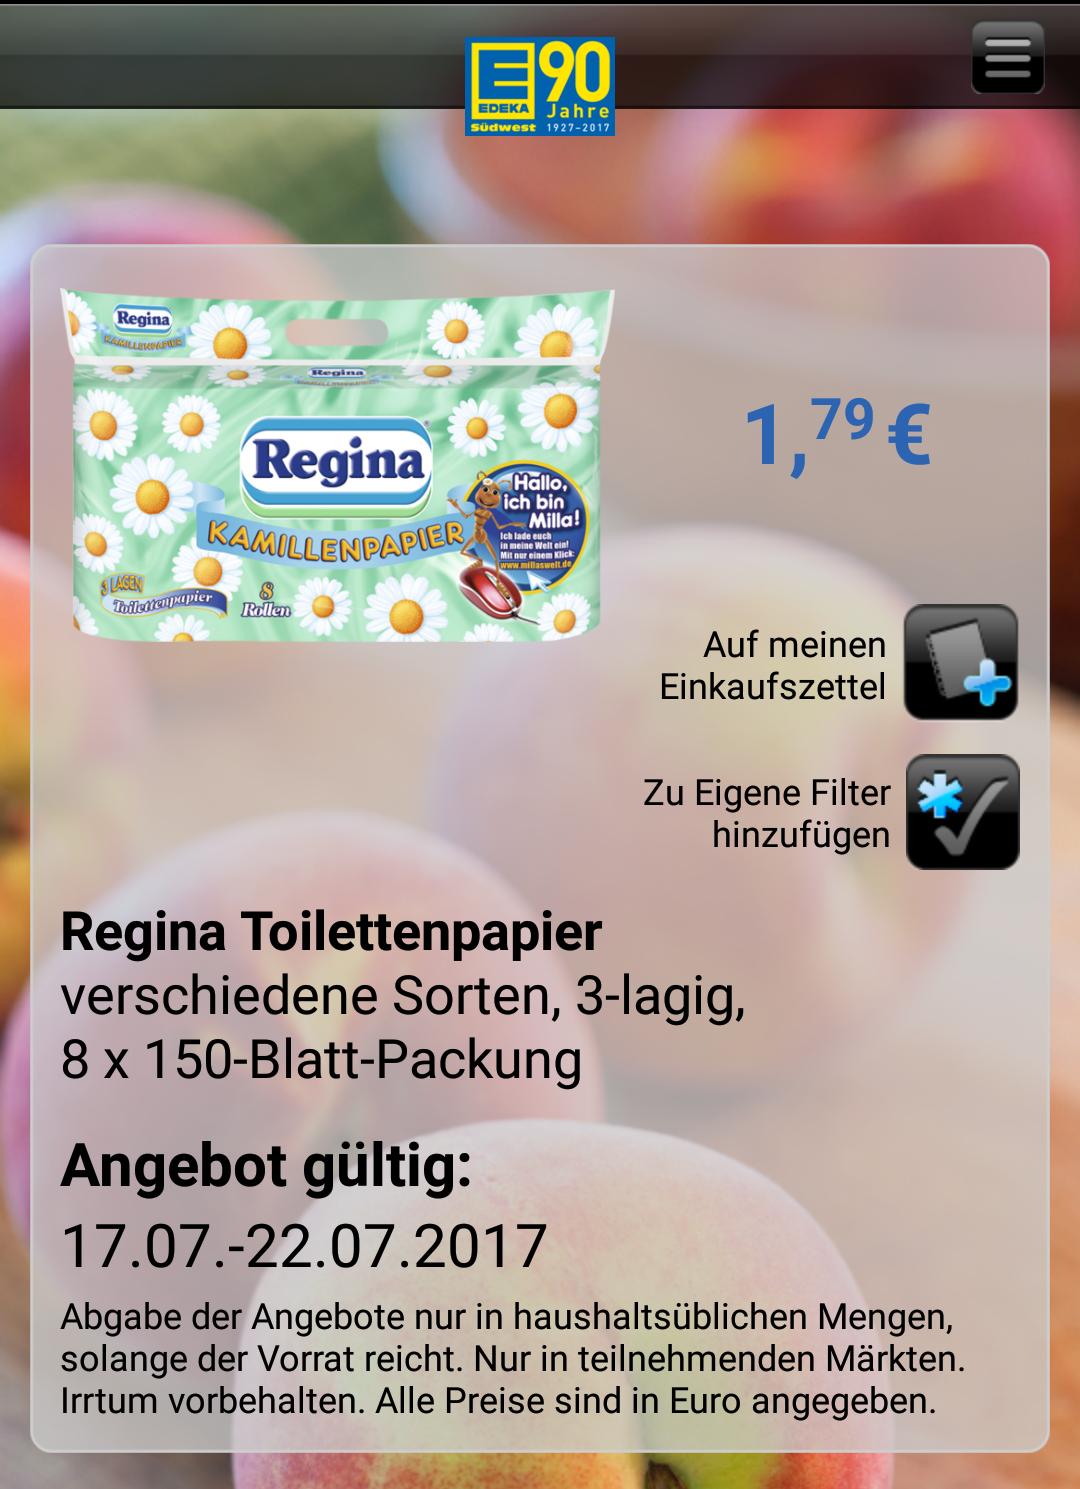 Regina Toilettenpapier bei Edeka im Angebot!